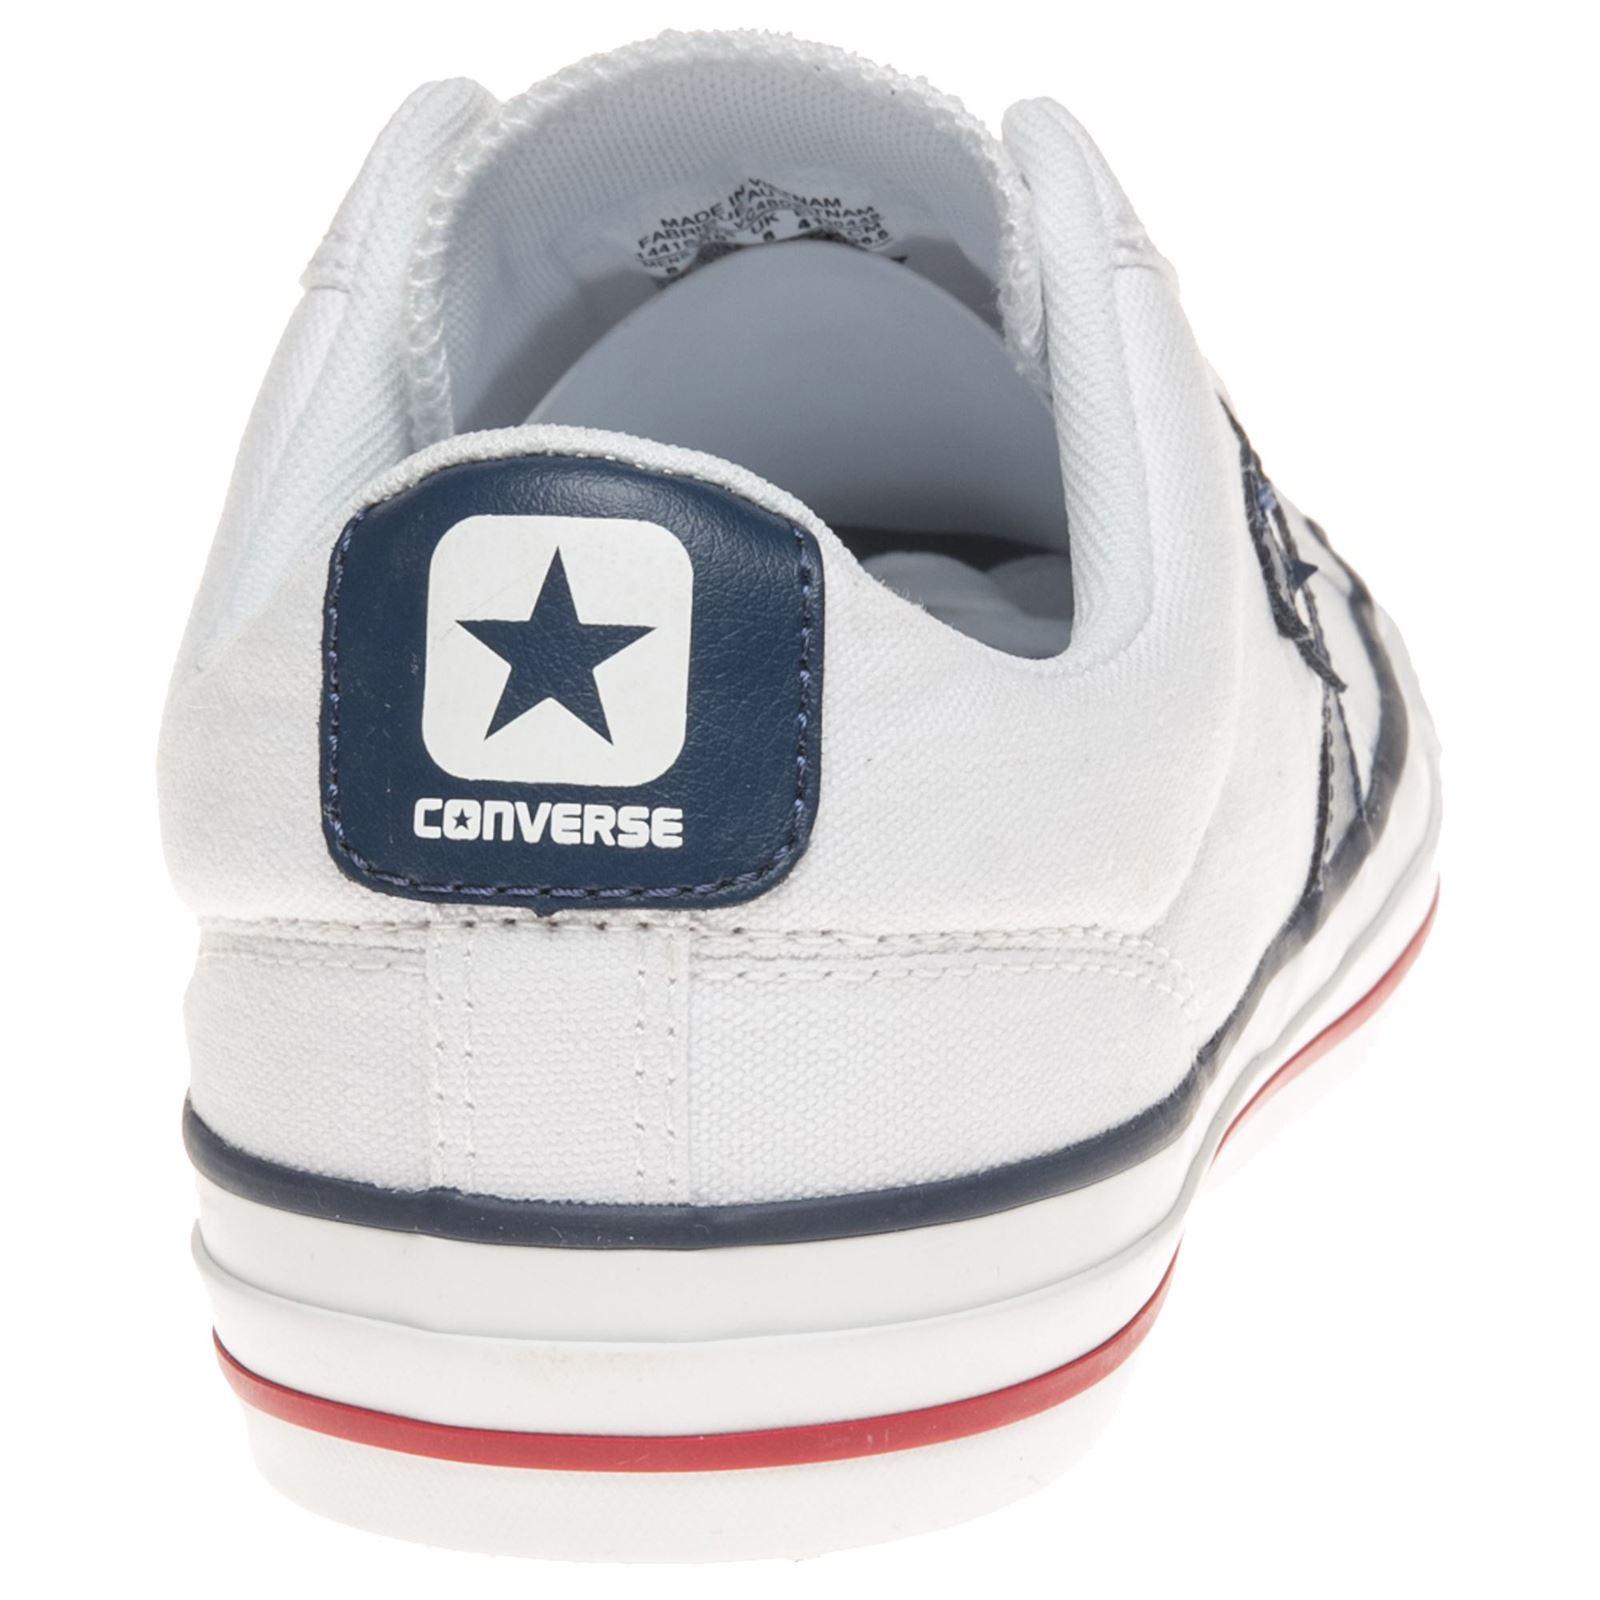 Converse Star Player Player Star Ox Men Trainers a7e2ec